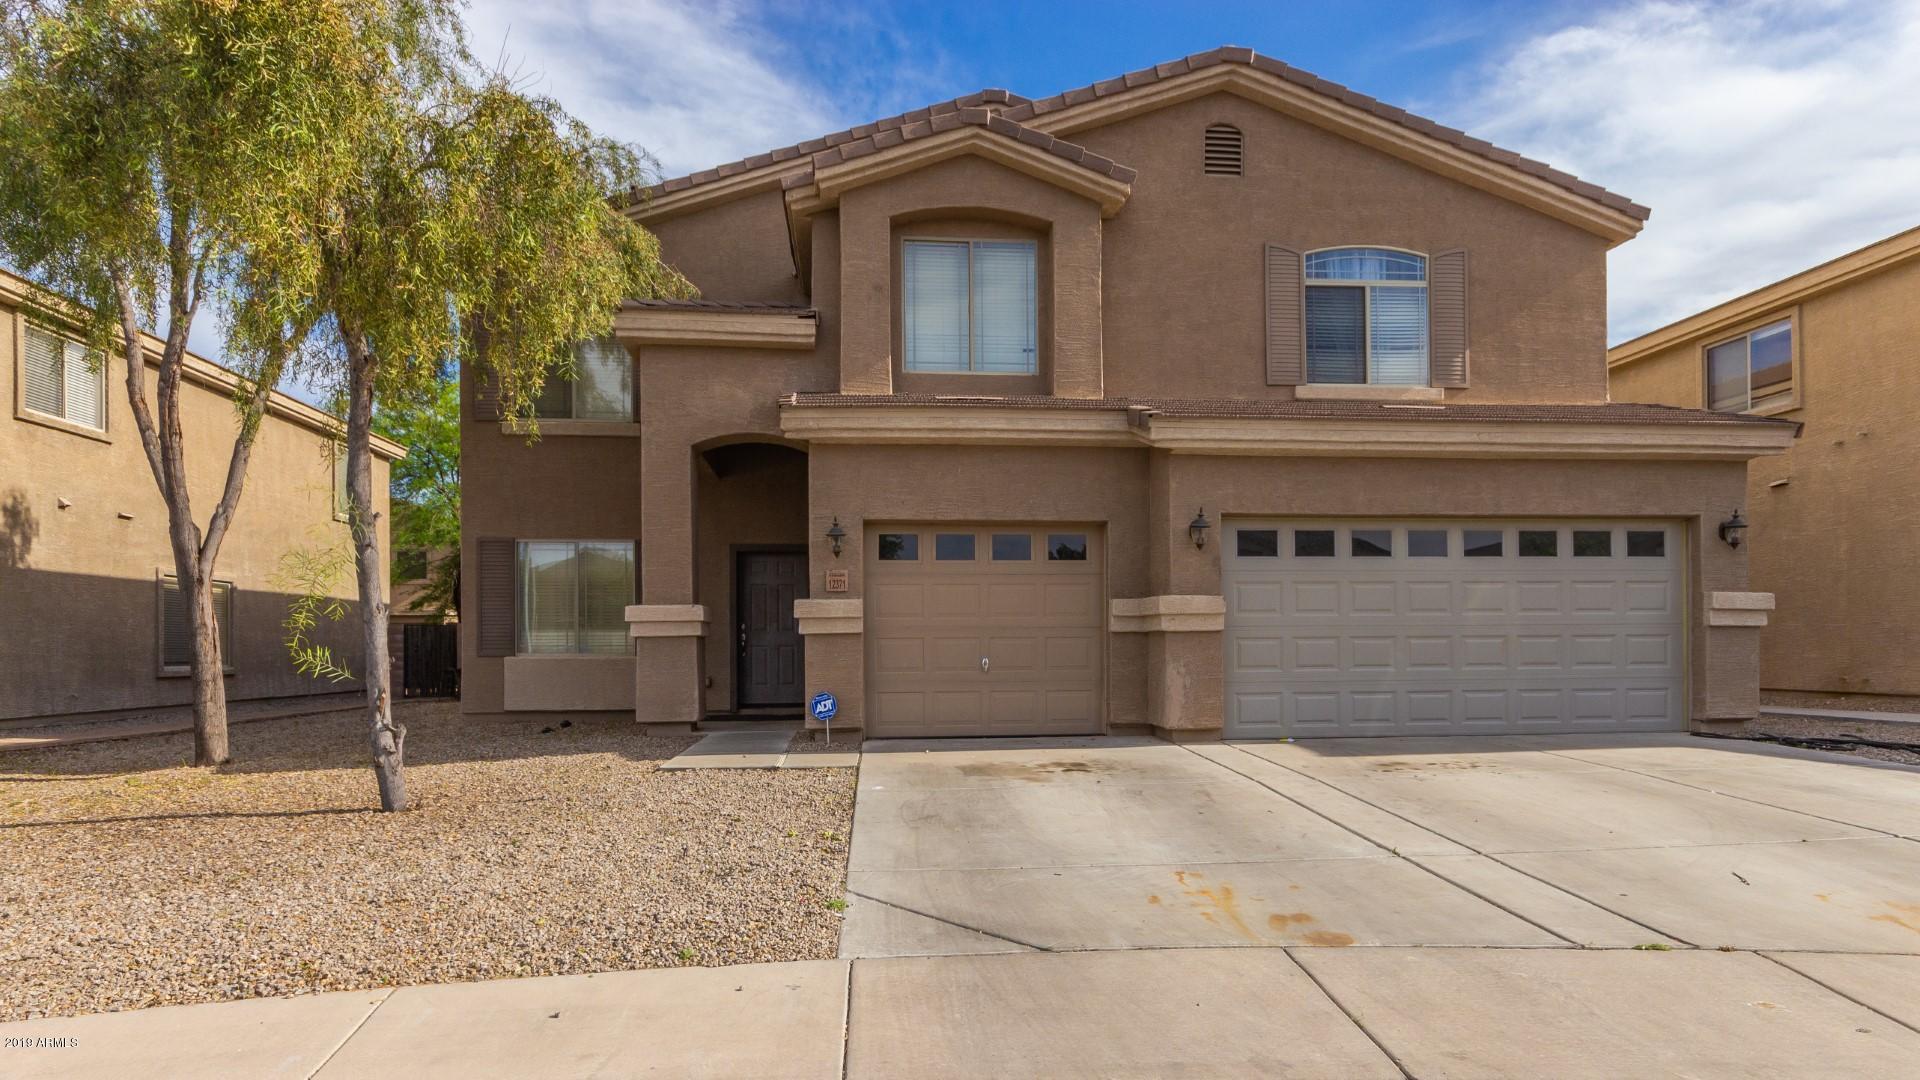 Photo of 12371 W SELLS Drive, Avondale, AZ 85392